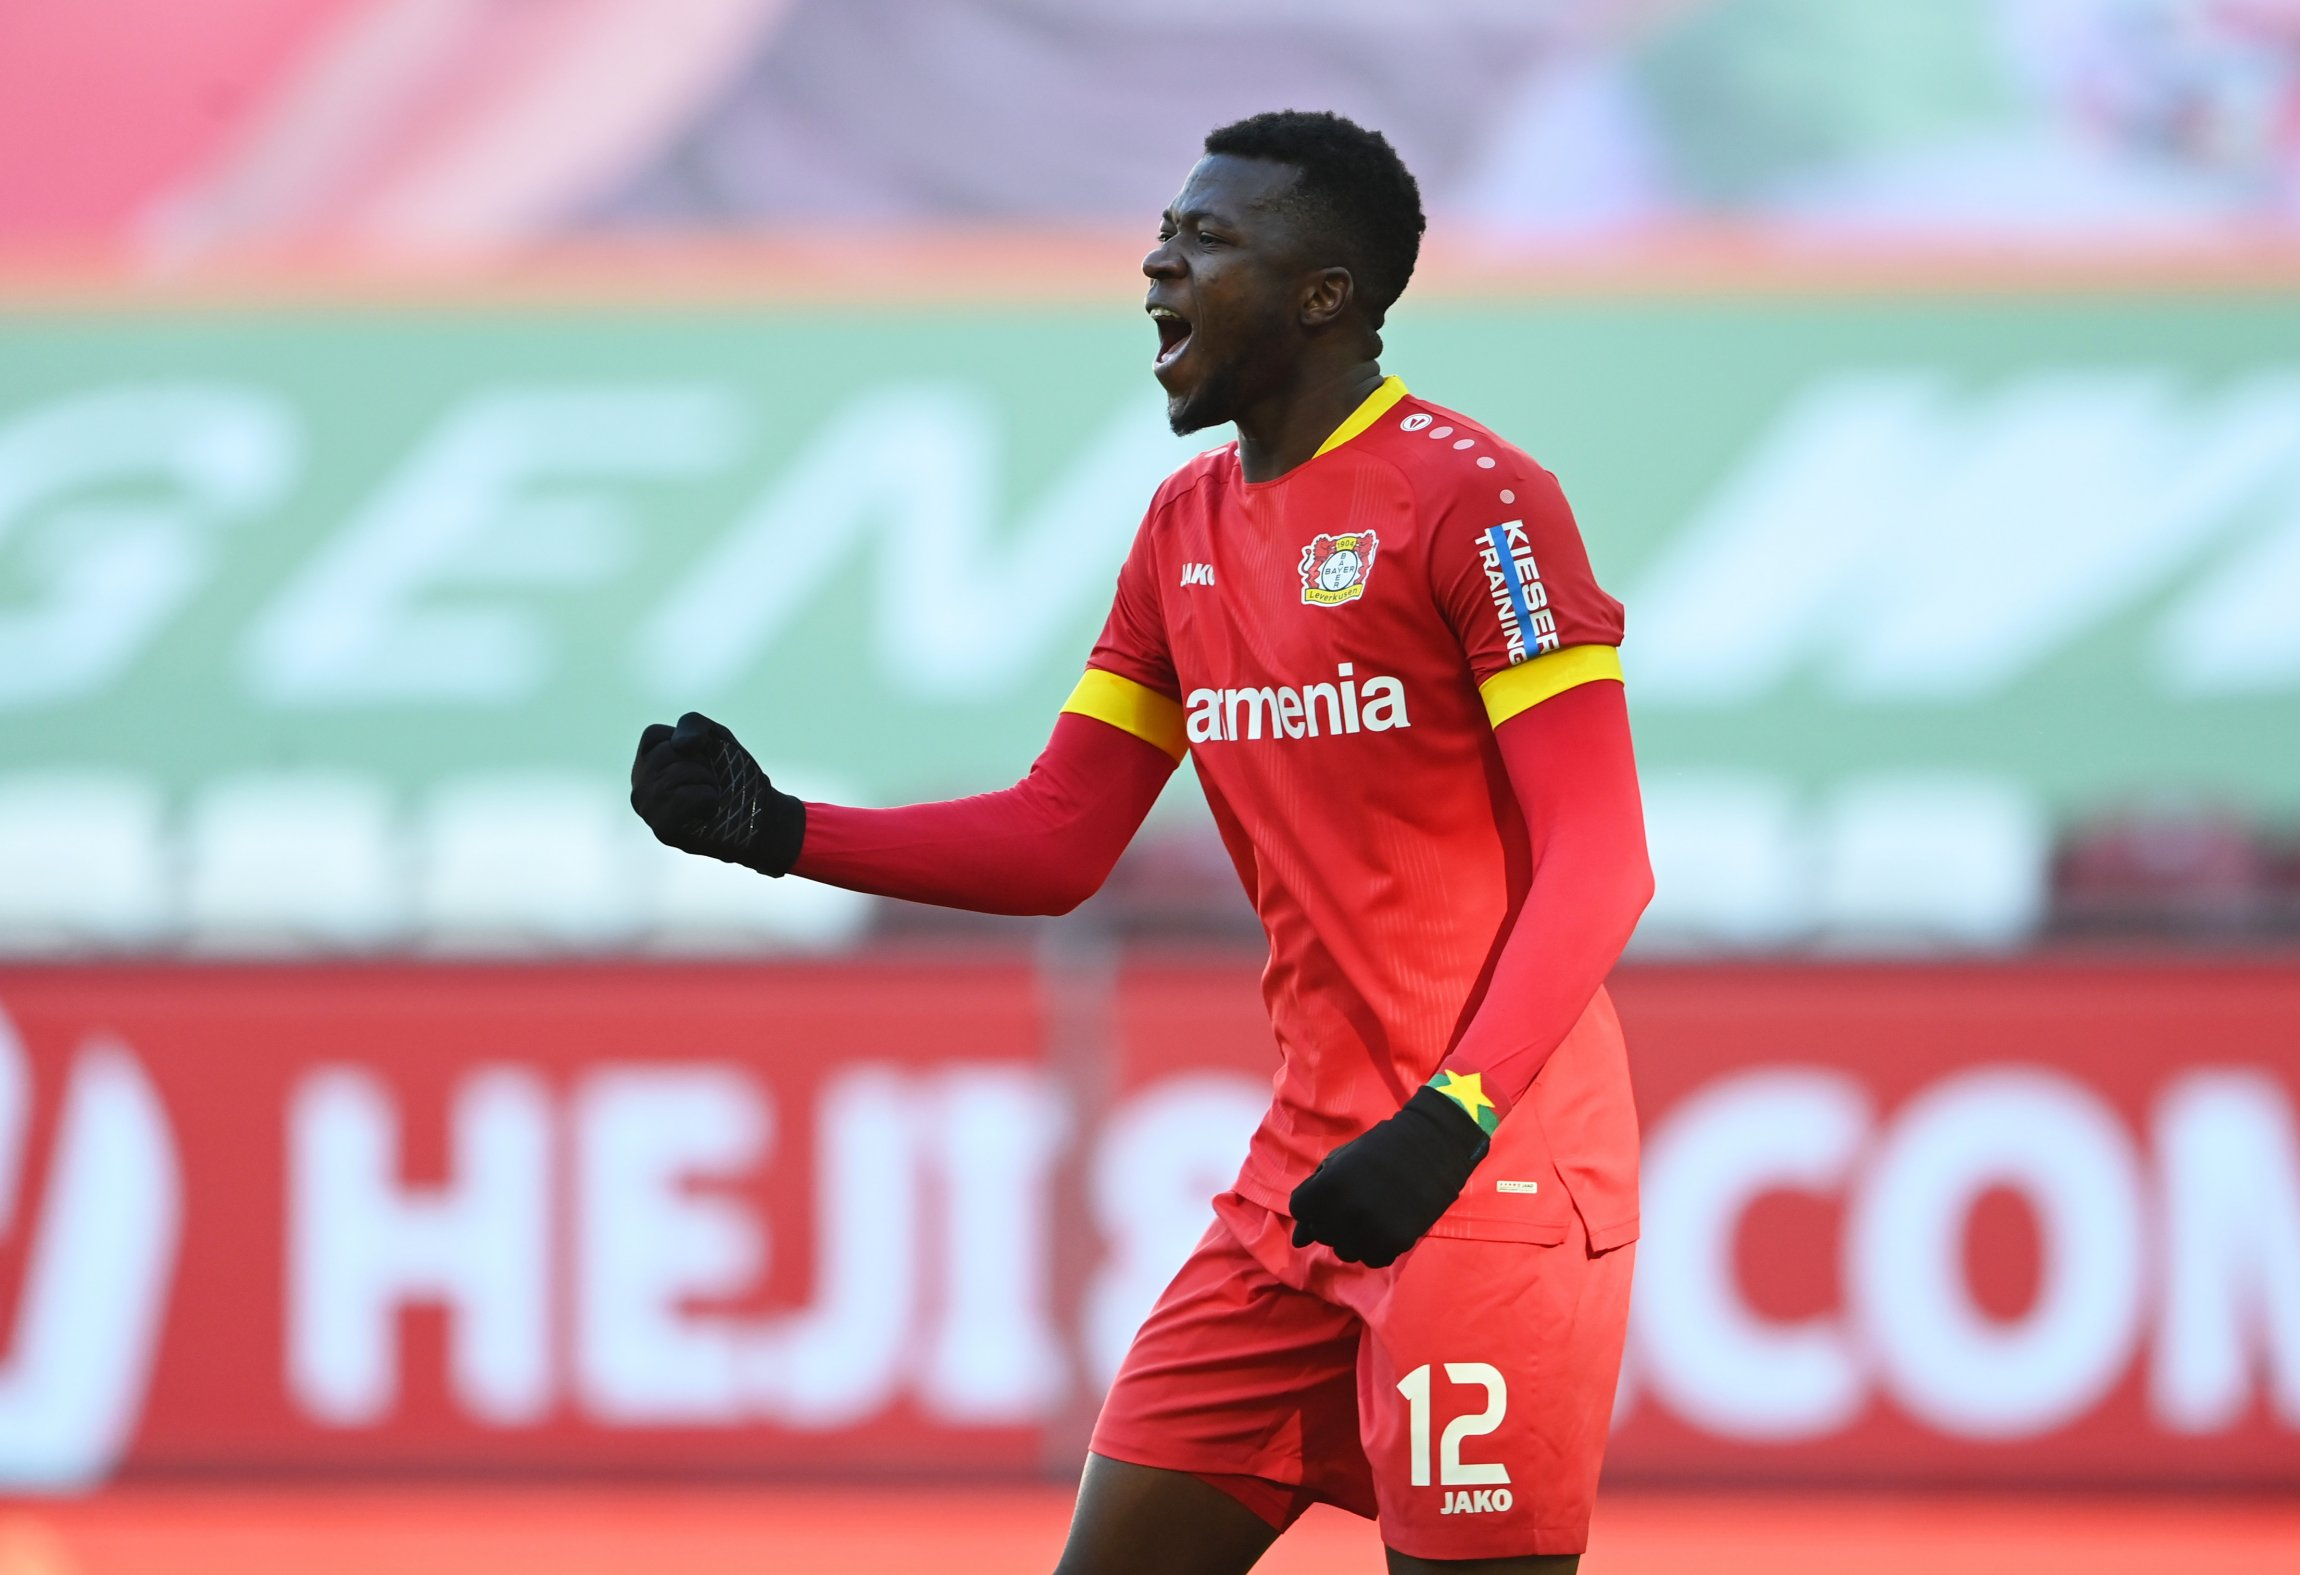 Man United must make move for Tapsoba | FootballFanCast.com